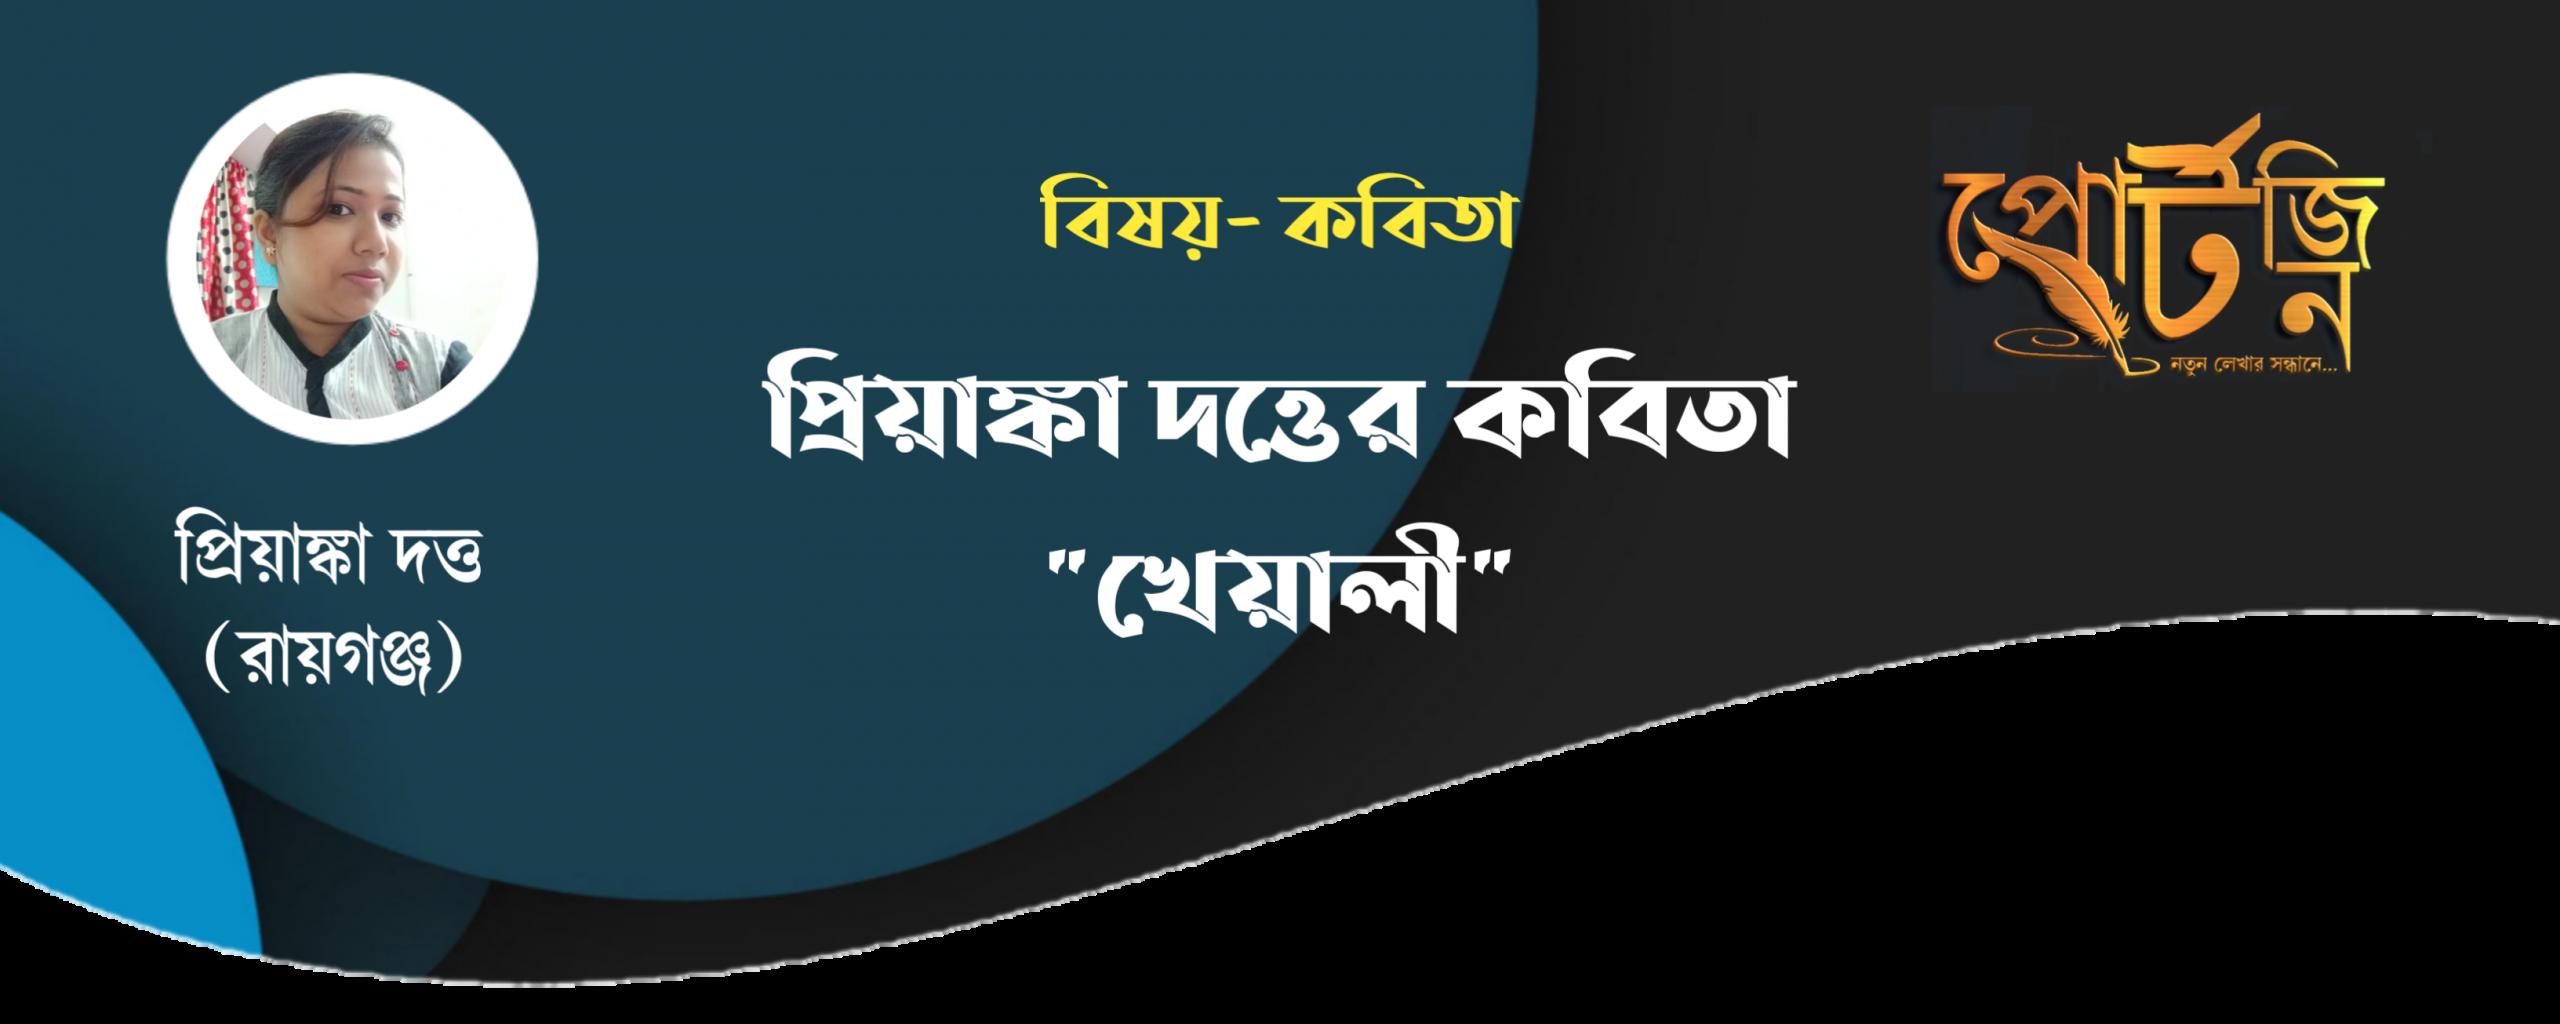 bengal live portzine bangla kobita priyanka dutta